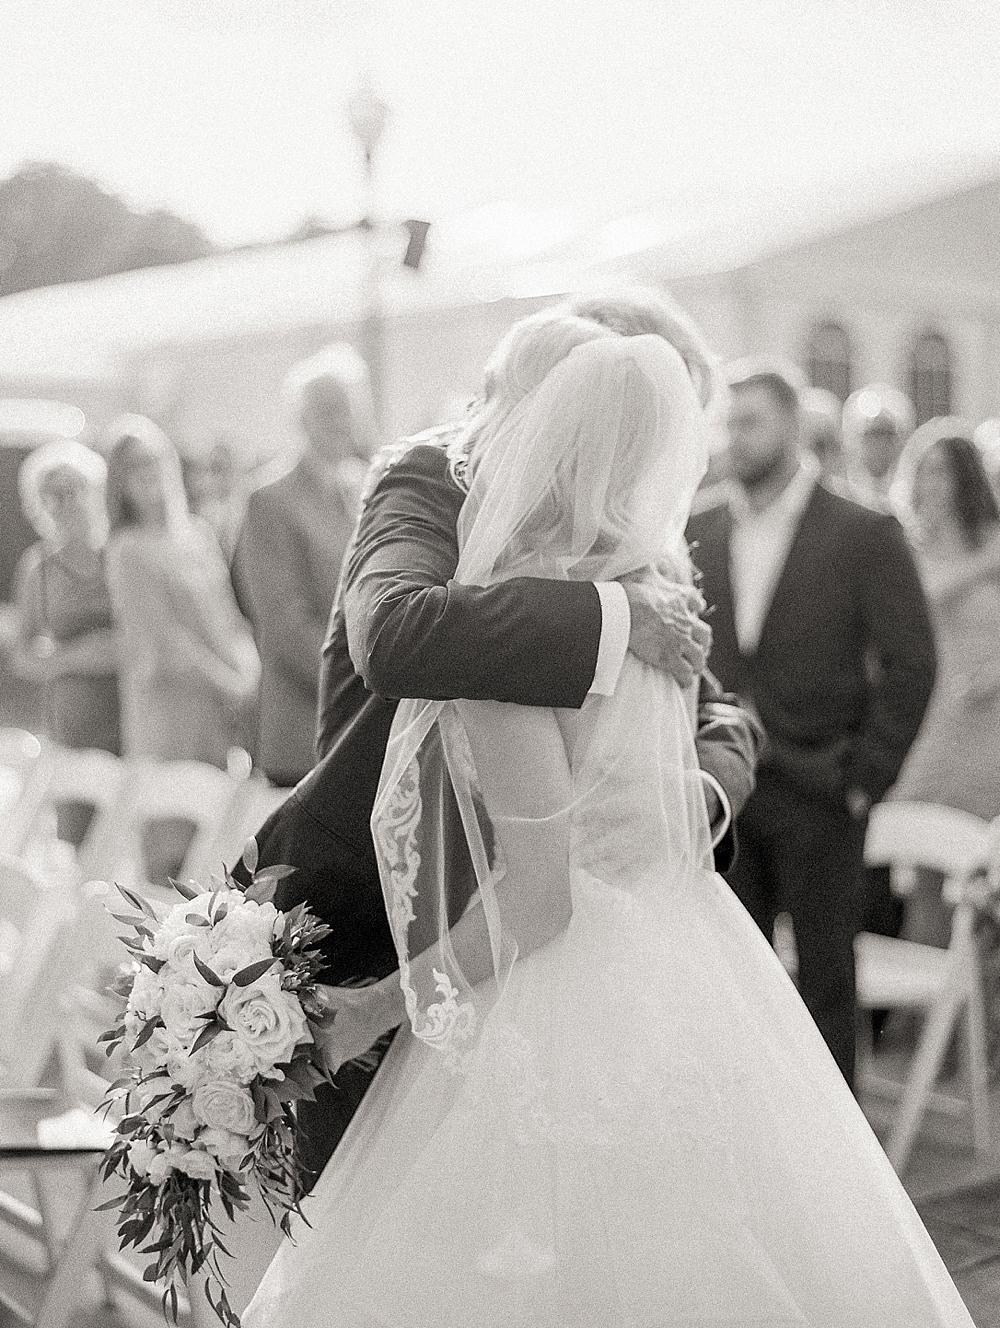 kristin-la-voie-photography-lehmann-mansion-wedding-photographer-129